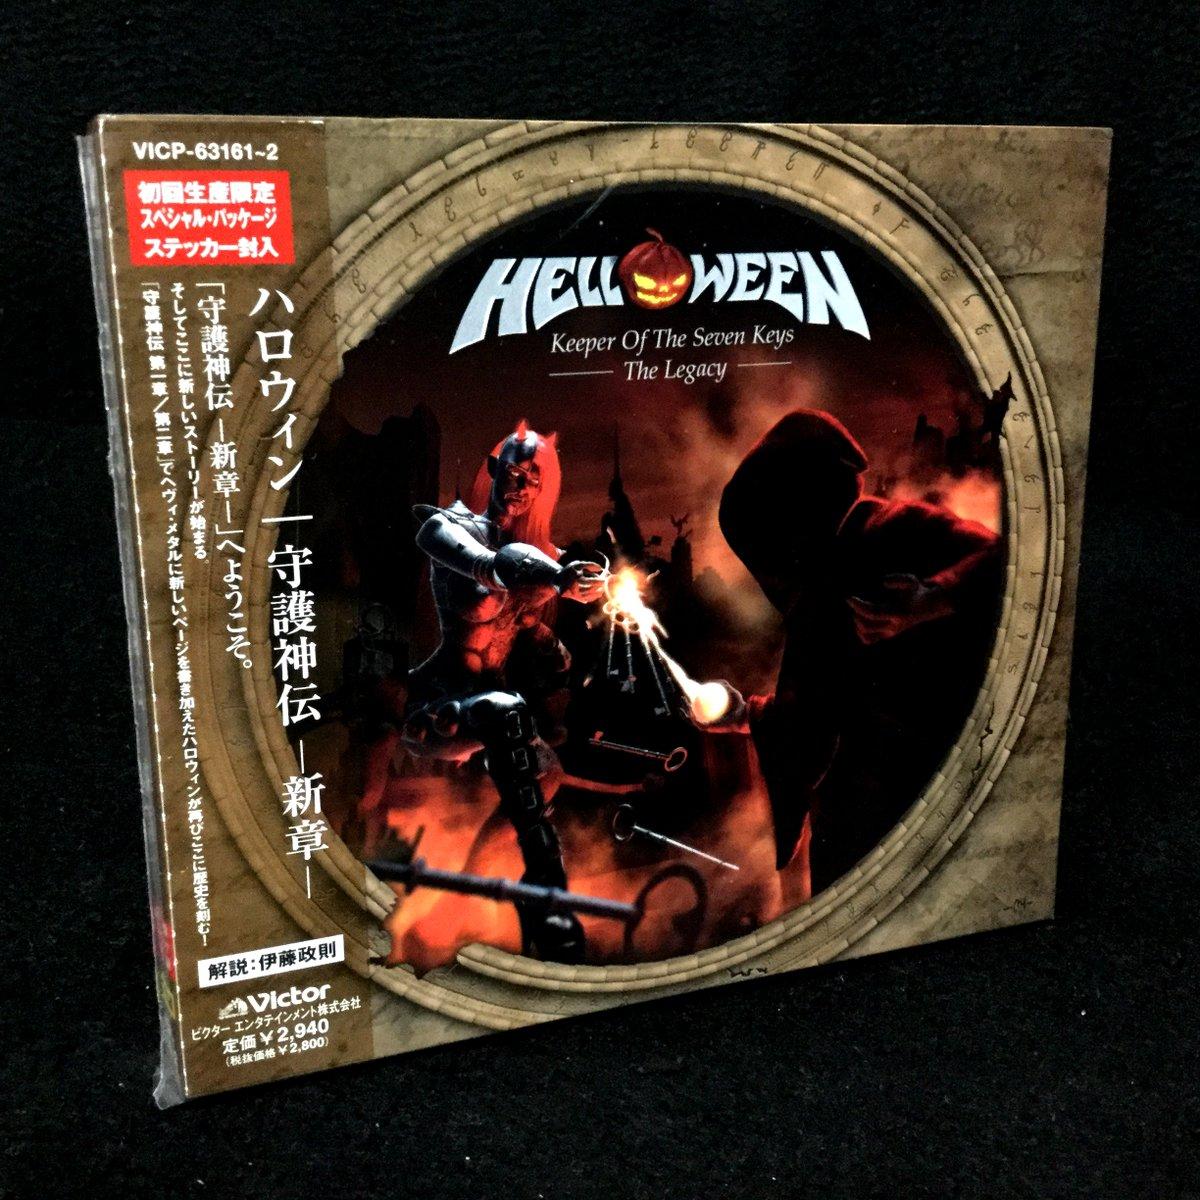 "15th ANNIVERSARY!!!!!!!!!!!!!!!!!!!!!!!!!!!!!!!!!!  HELLOWEEN ""Keeper Of The Seven Keys: The Legacy"" [October 28th, 2005 MA / October 31st, 2005 wiki,JAPAN]  #HELLOWEEN #KeeperOfTheSevenKeys #守護神伝 #守護神伝新章 https://t.co/bPBRwAfjA2"